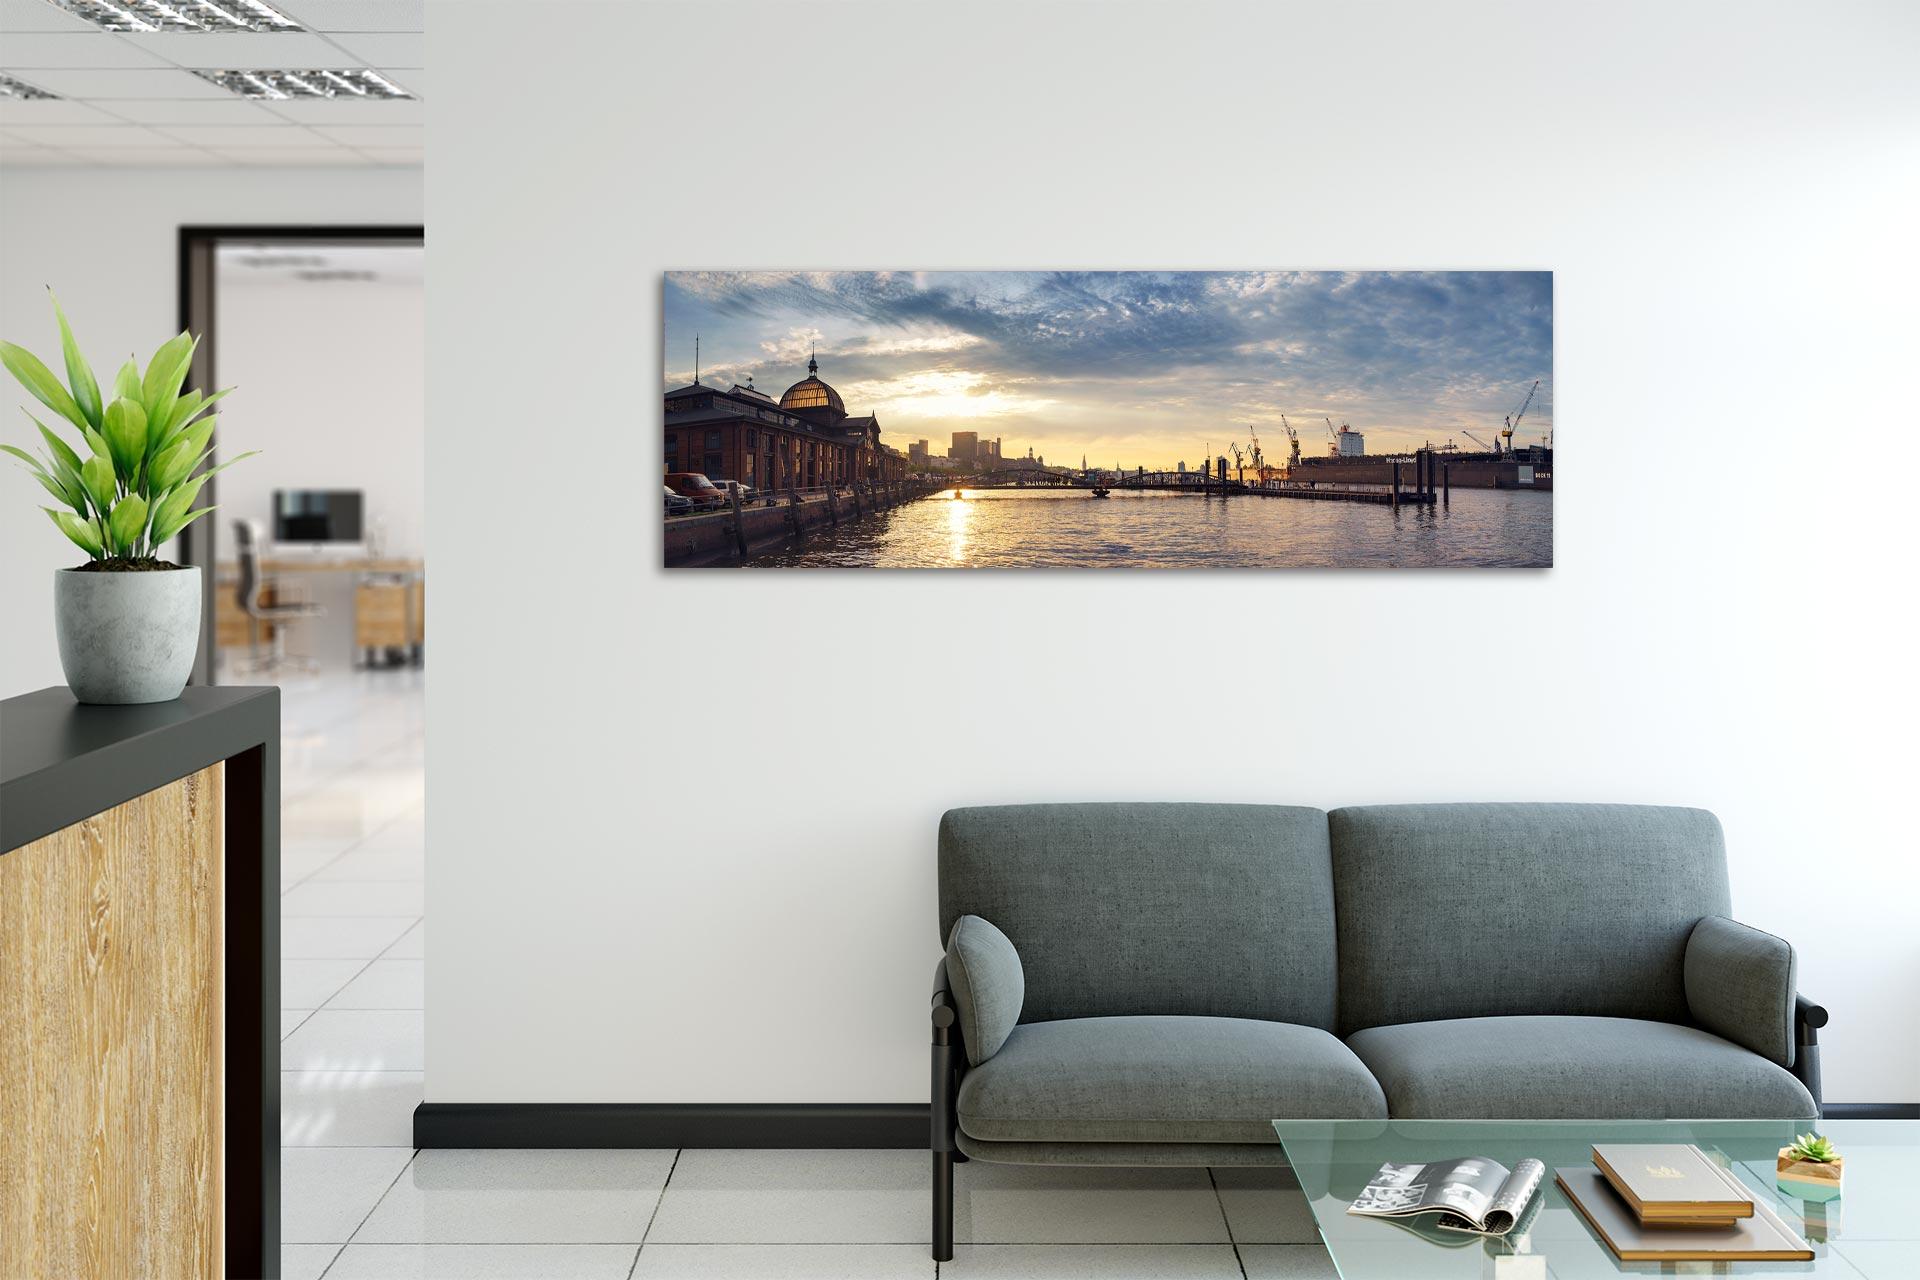 TG065-fischmarkt-hamburg-wandbild-auf-leinwand-acrylglas-aludibond-empfang